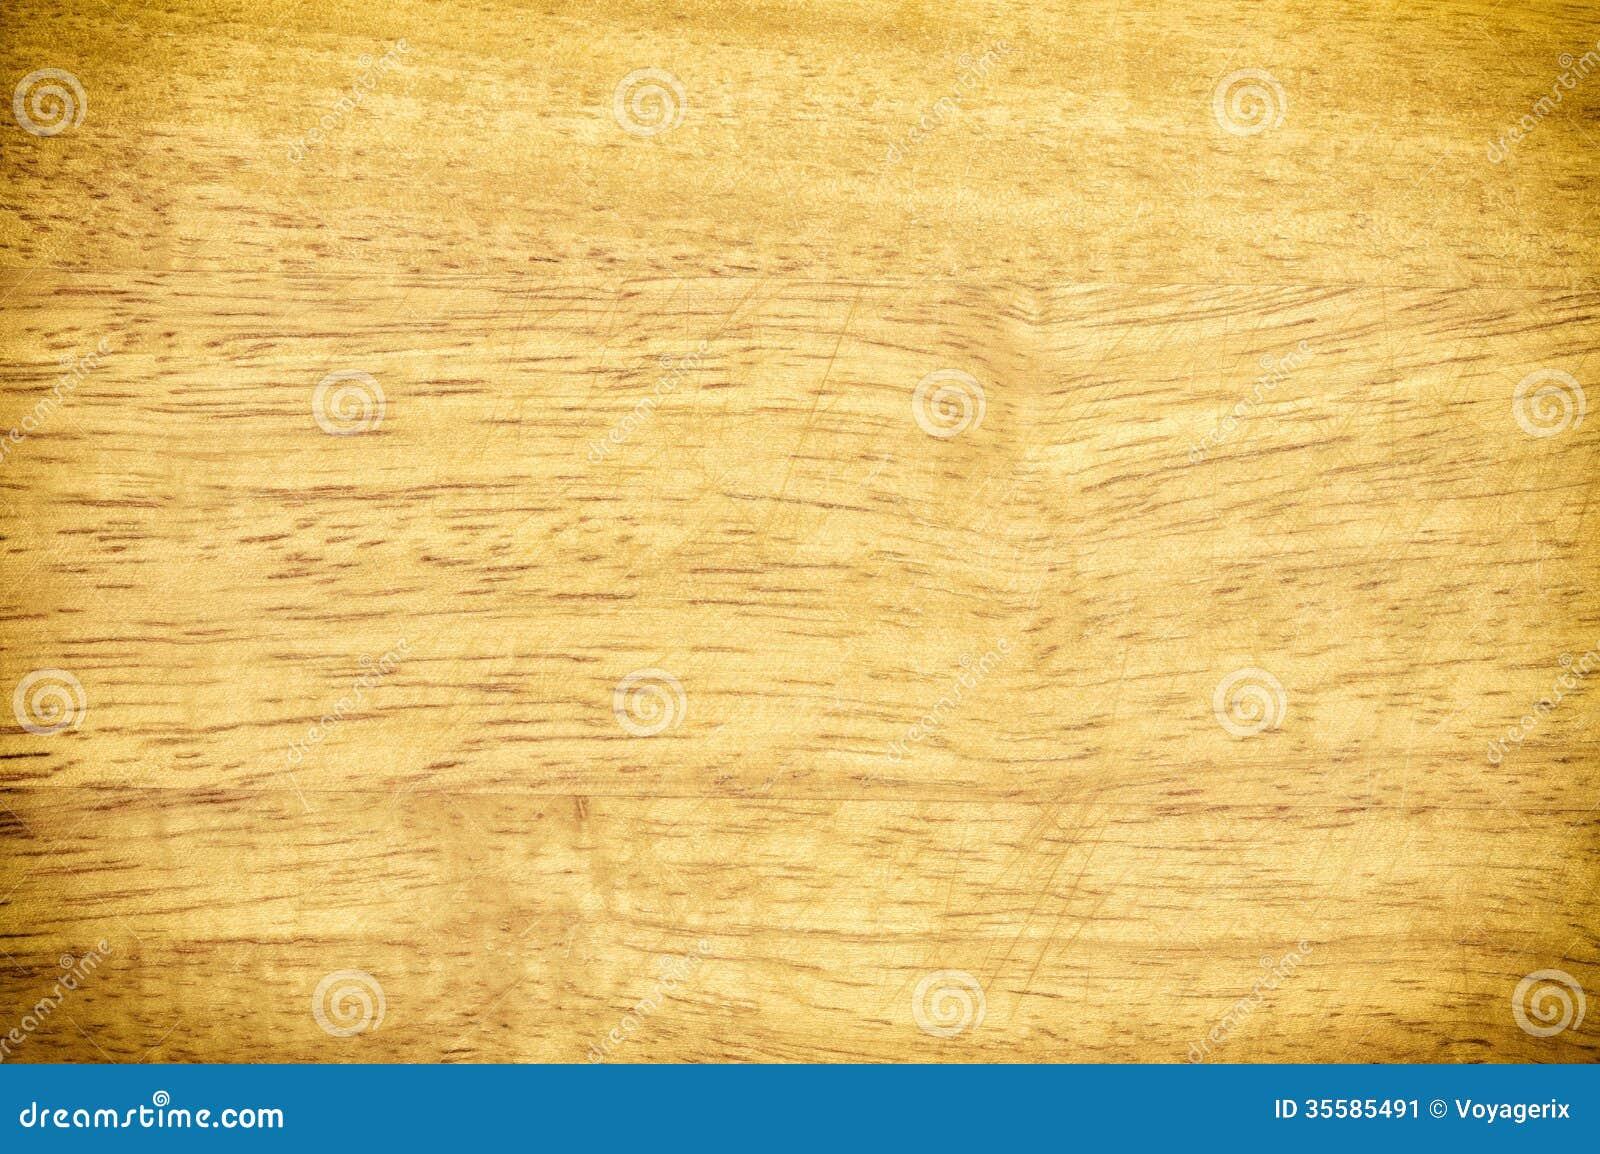 Old Wooden Kitchen Desk Board Background Texture Stock